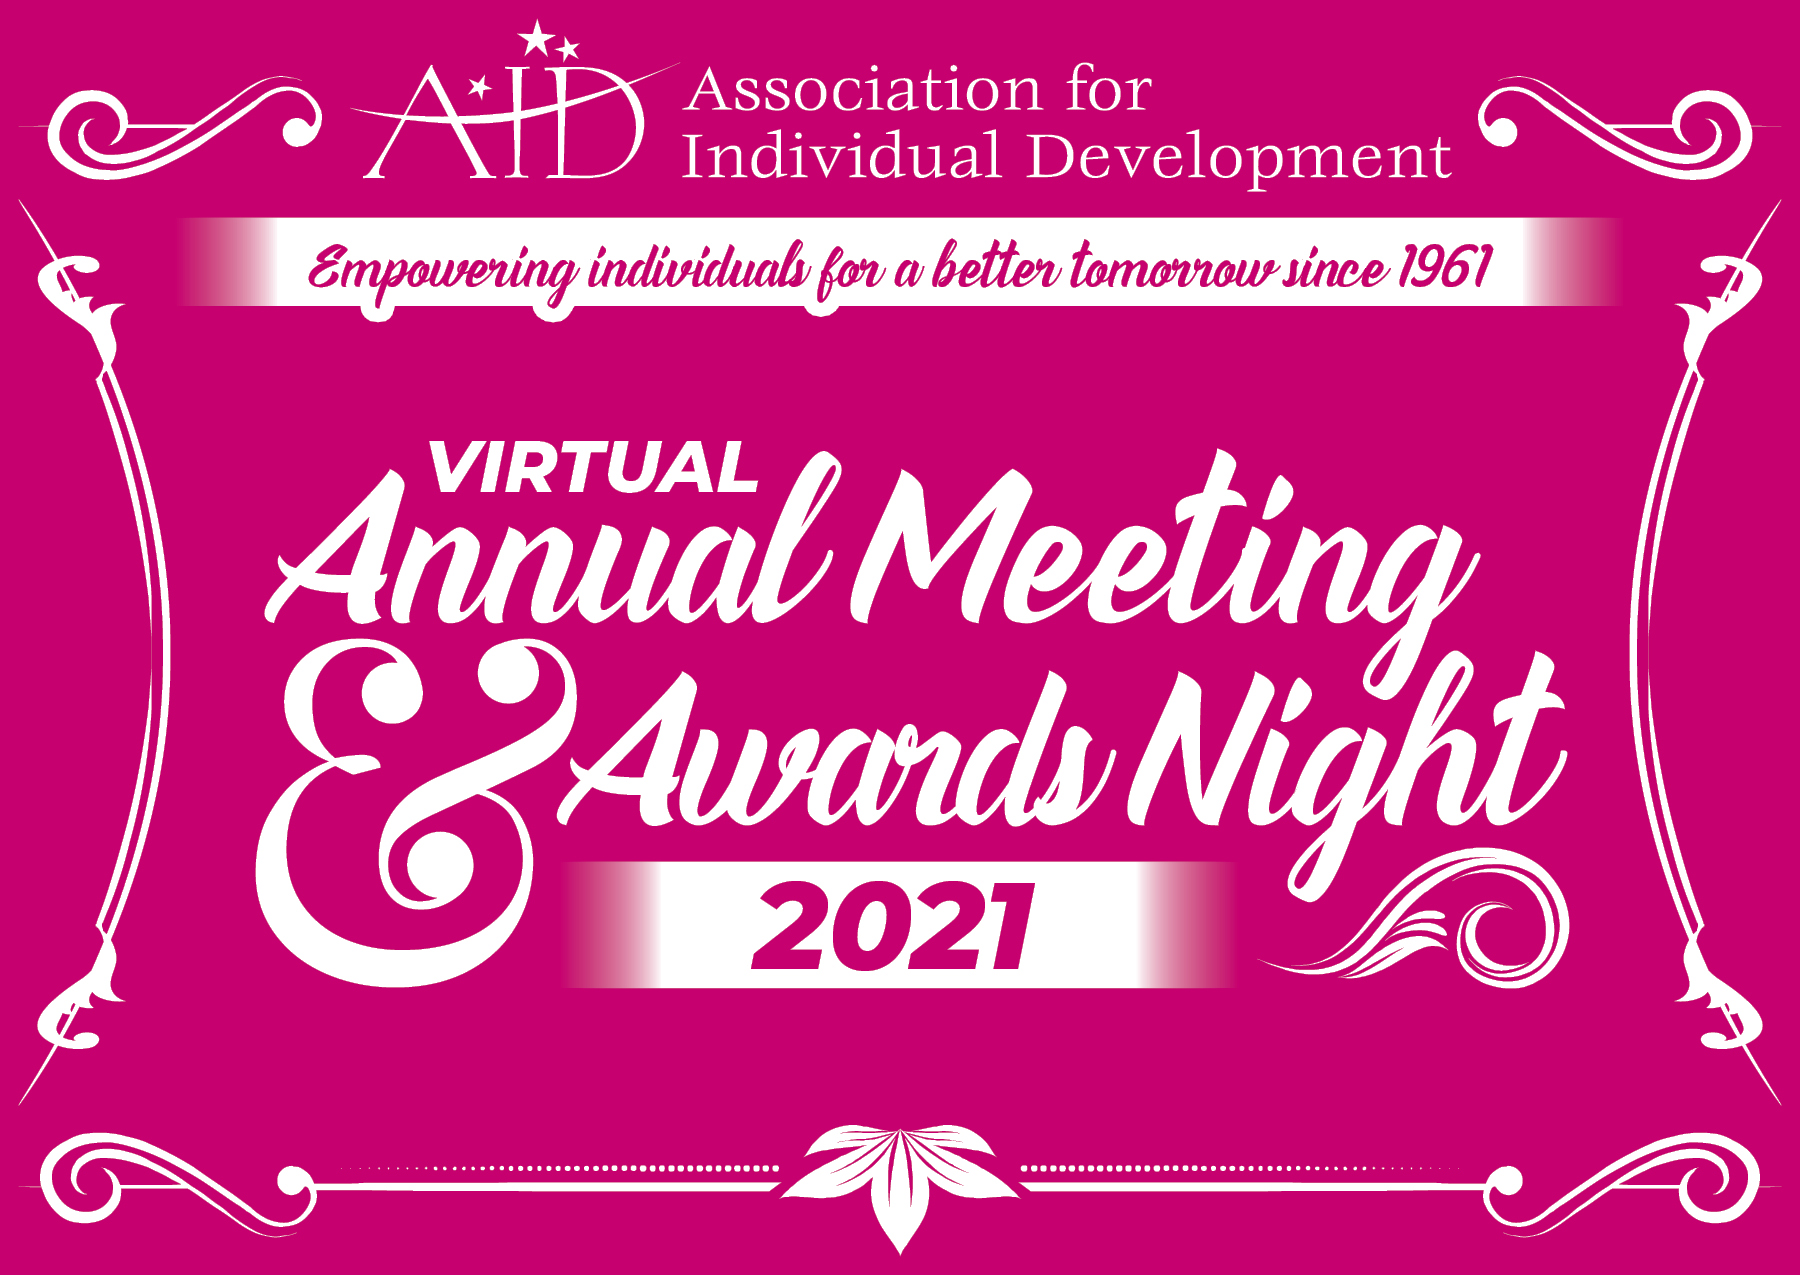 Virtual Annual Meeting & Awards Night 2021